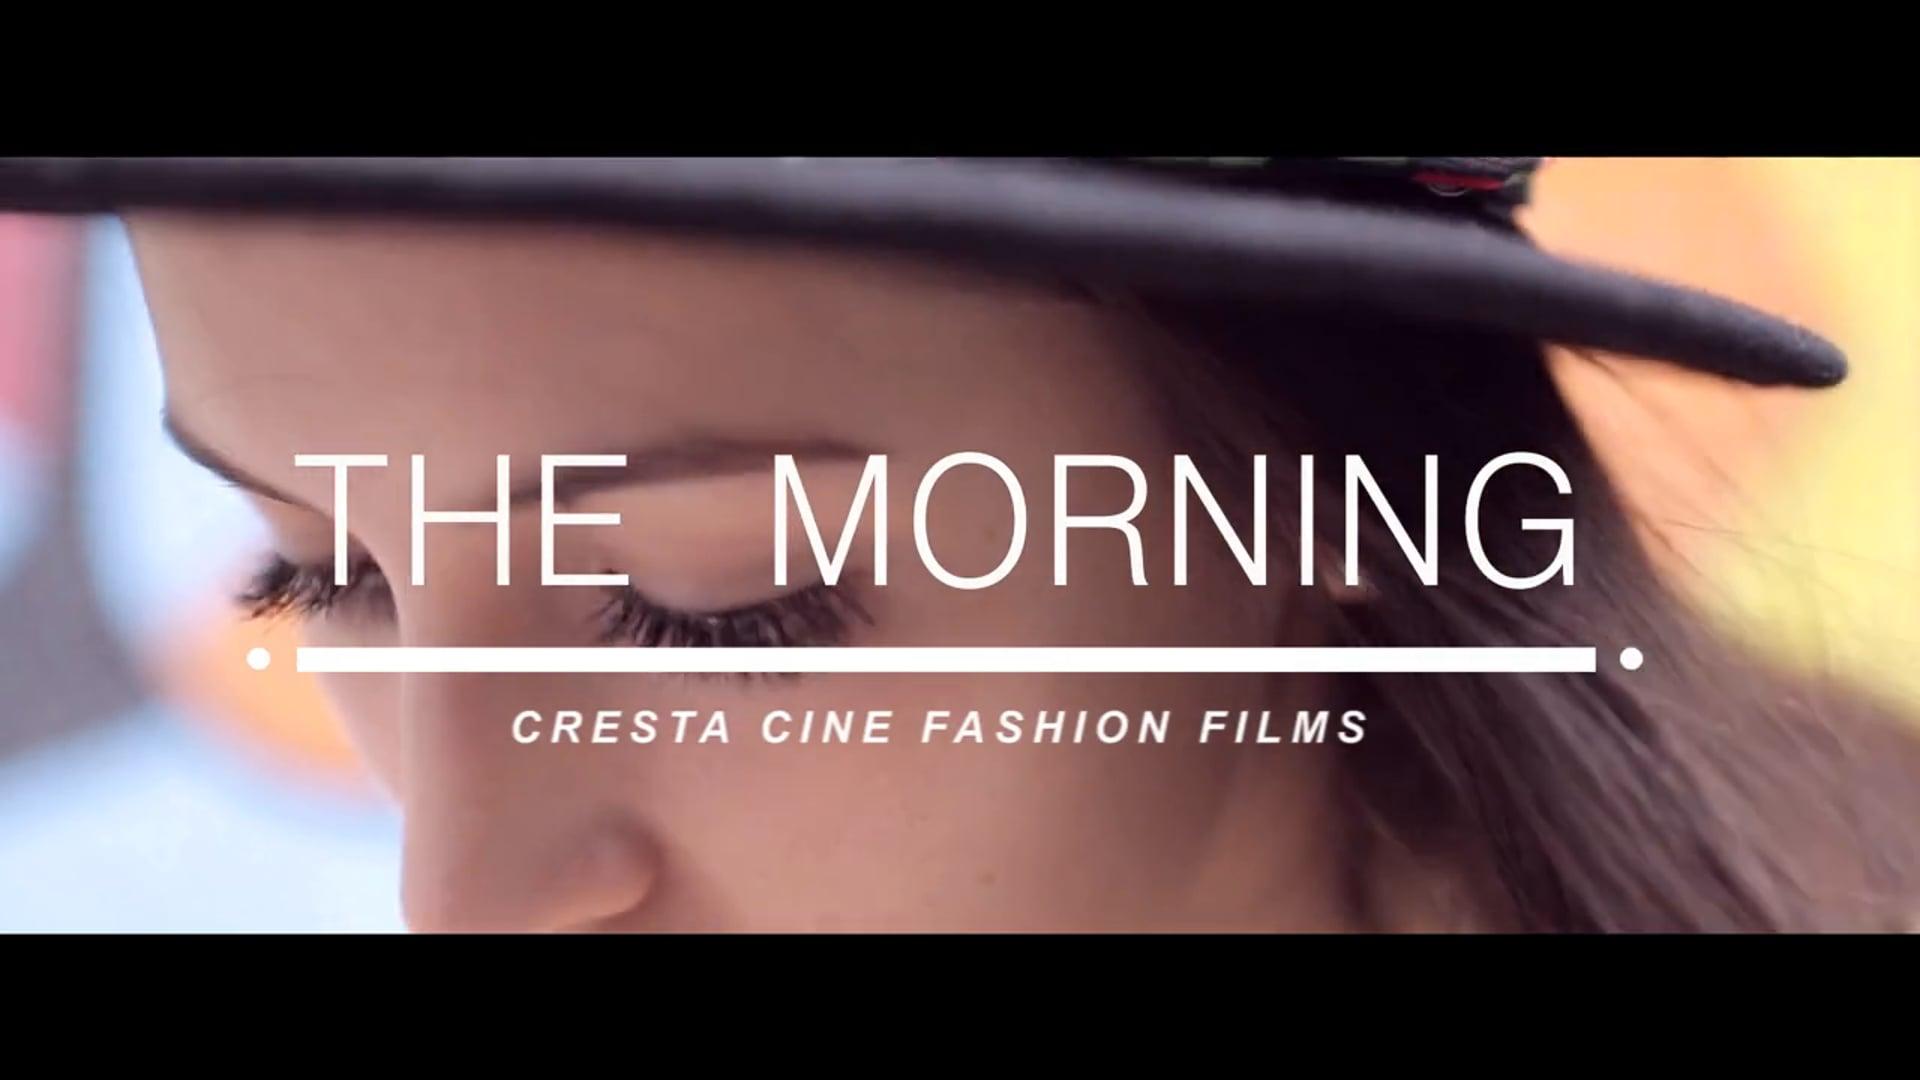 The Morning - Fashion Film